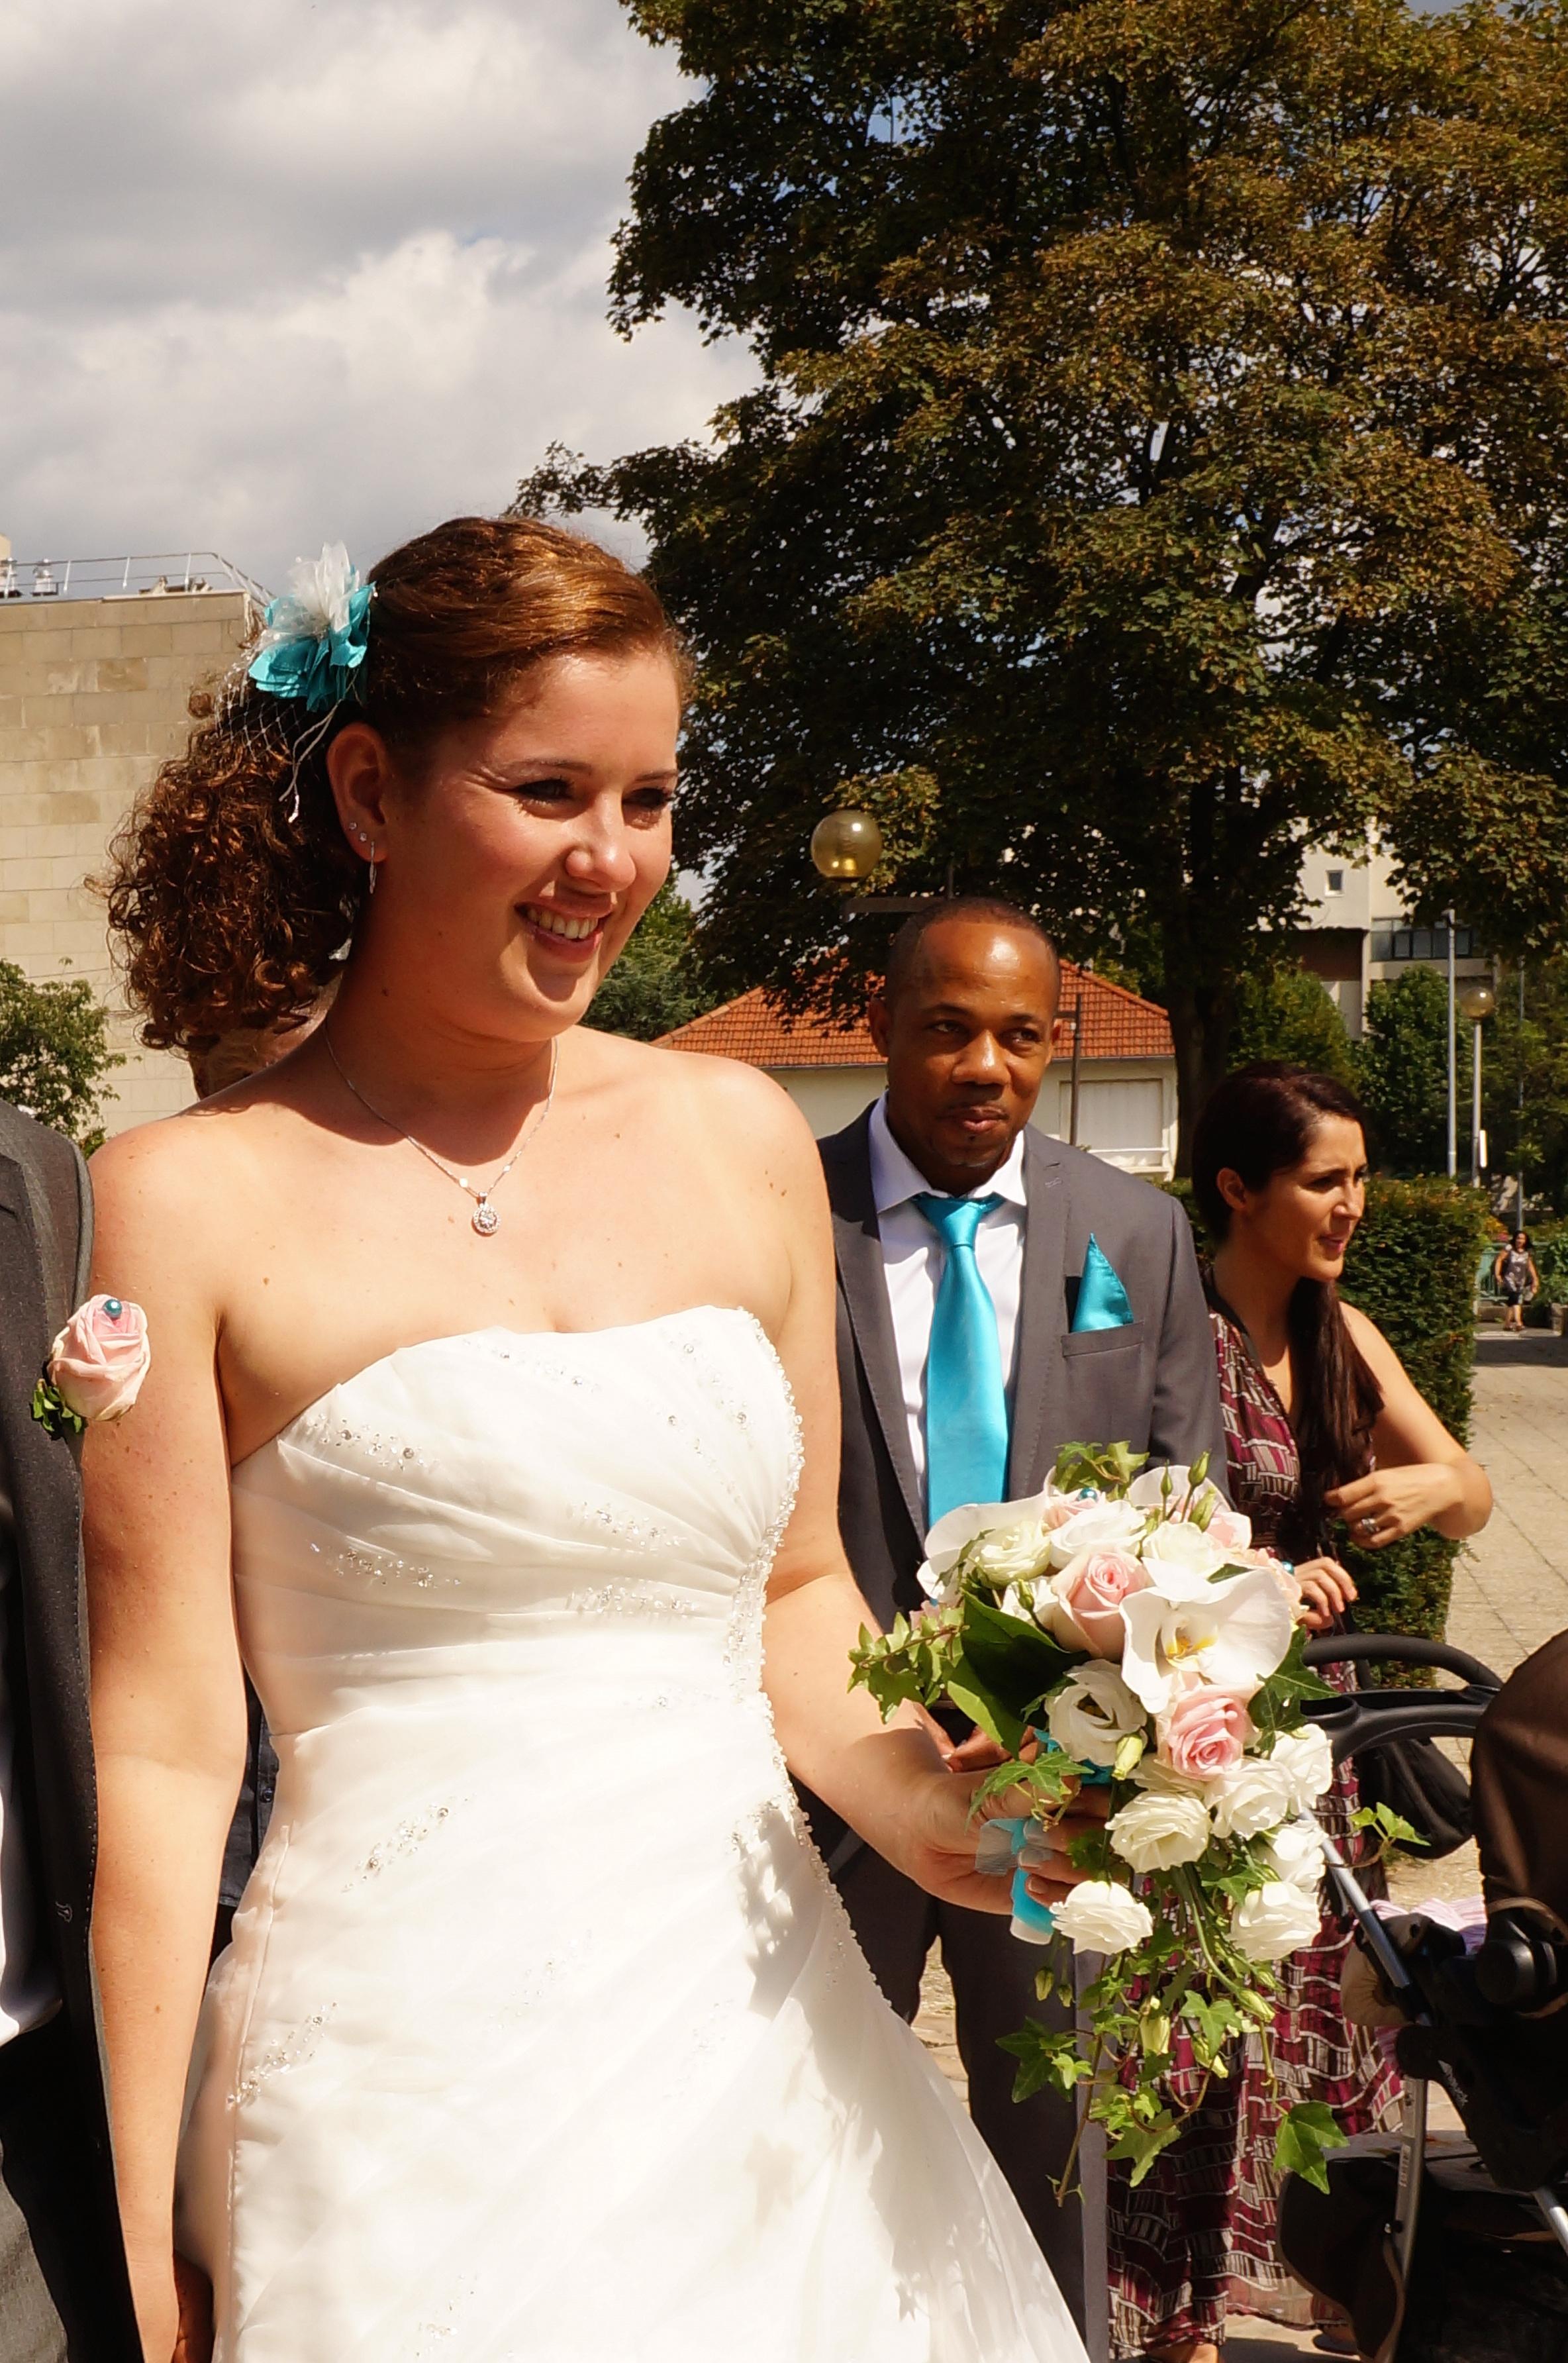 Mariage d'Aude